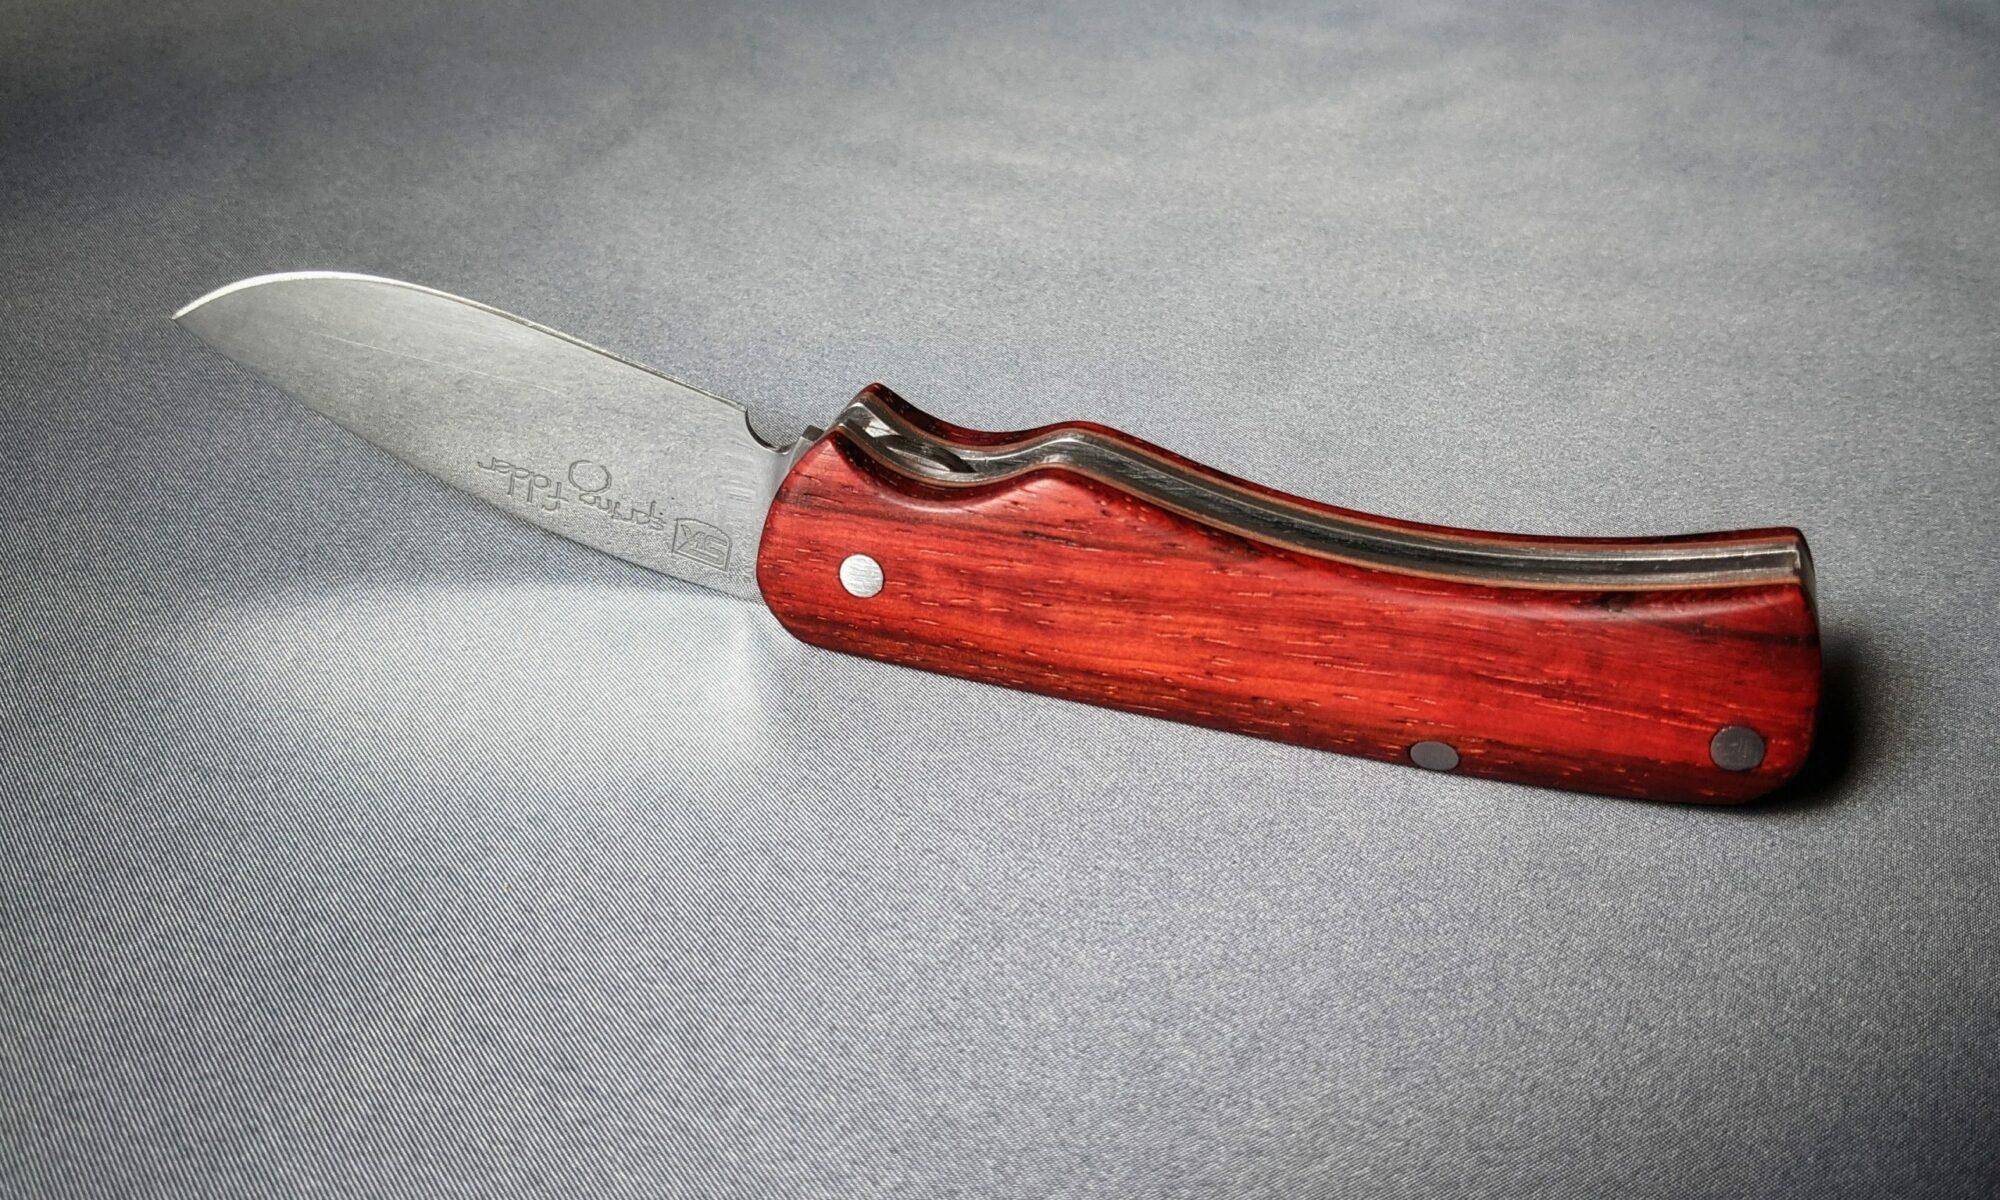 Spring folder knife header image with padouk handle scales